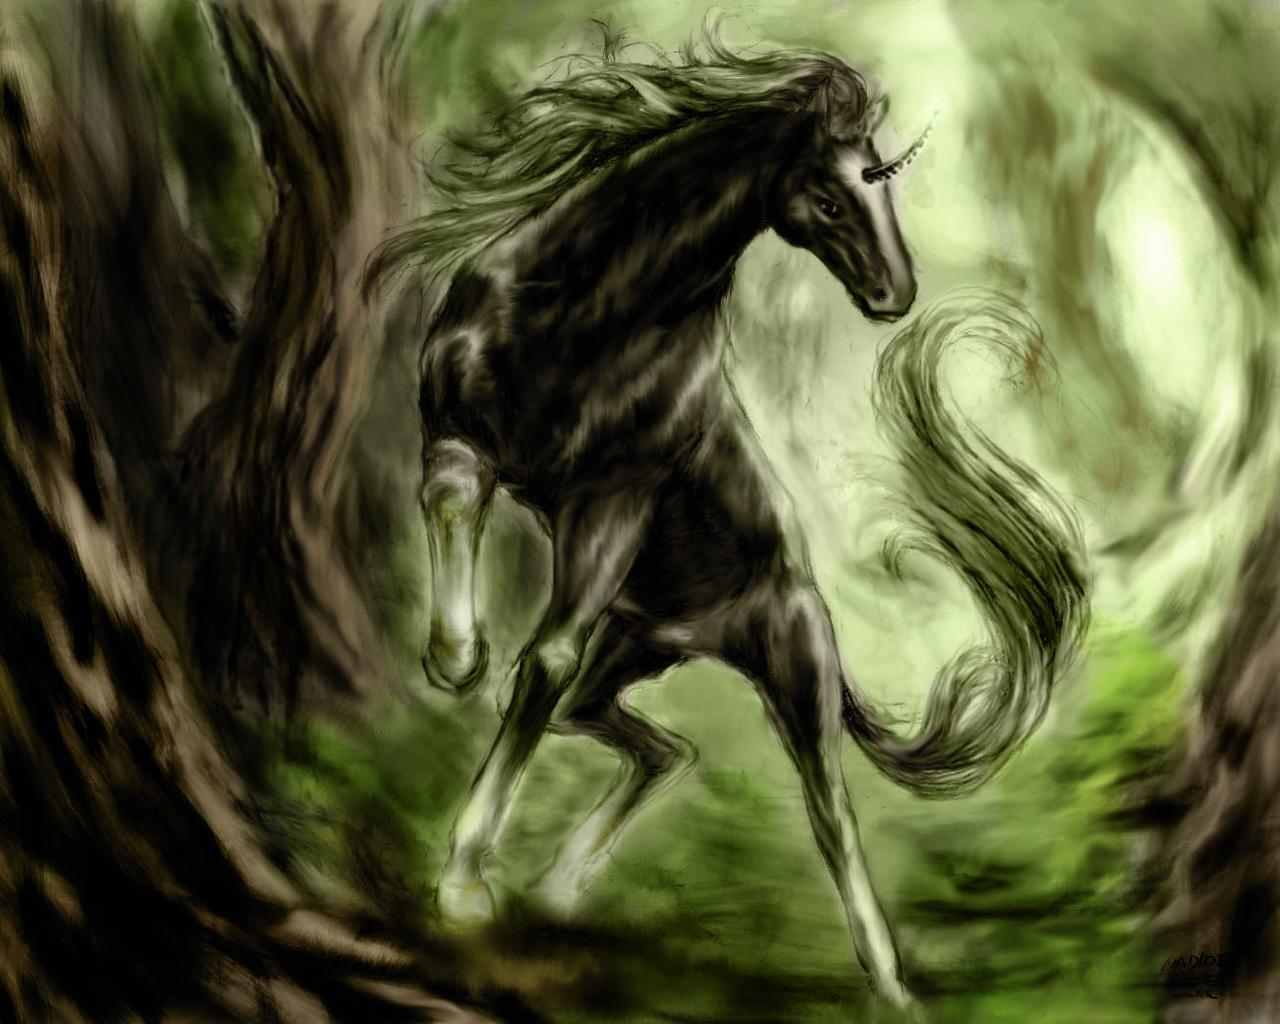 Anime Horse Fan Art 1280x1024 Wallpaper Teahub Io